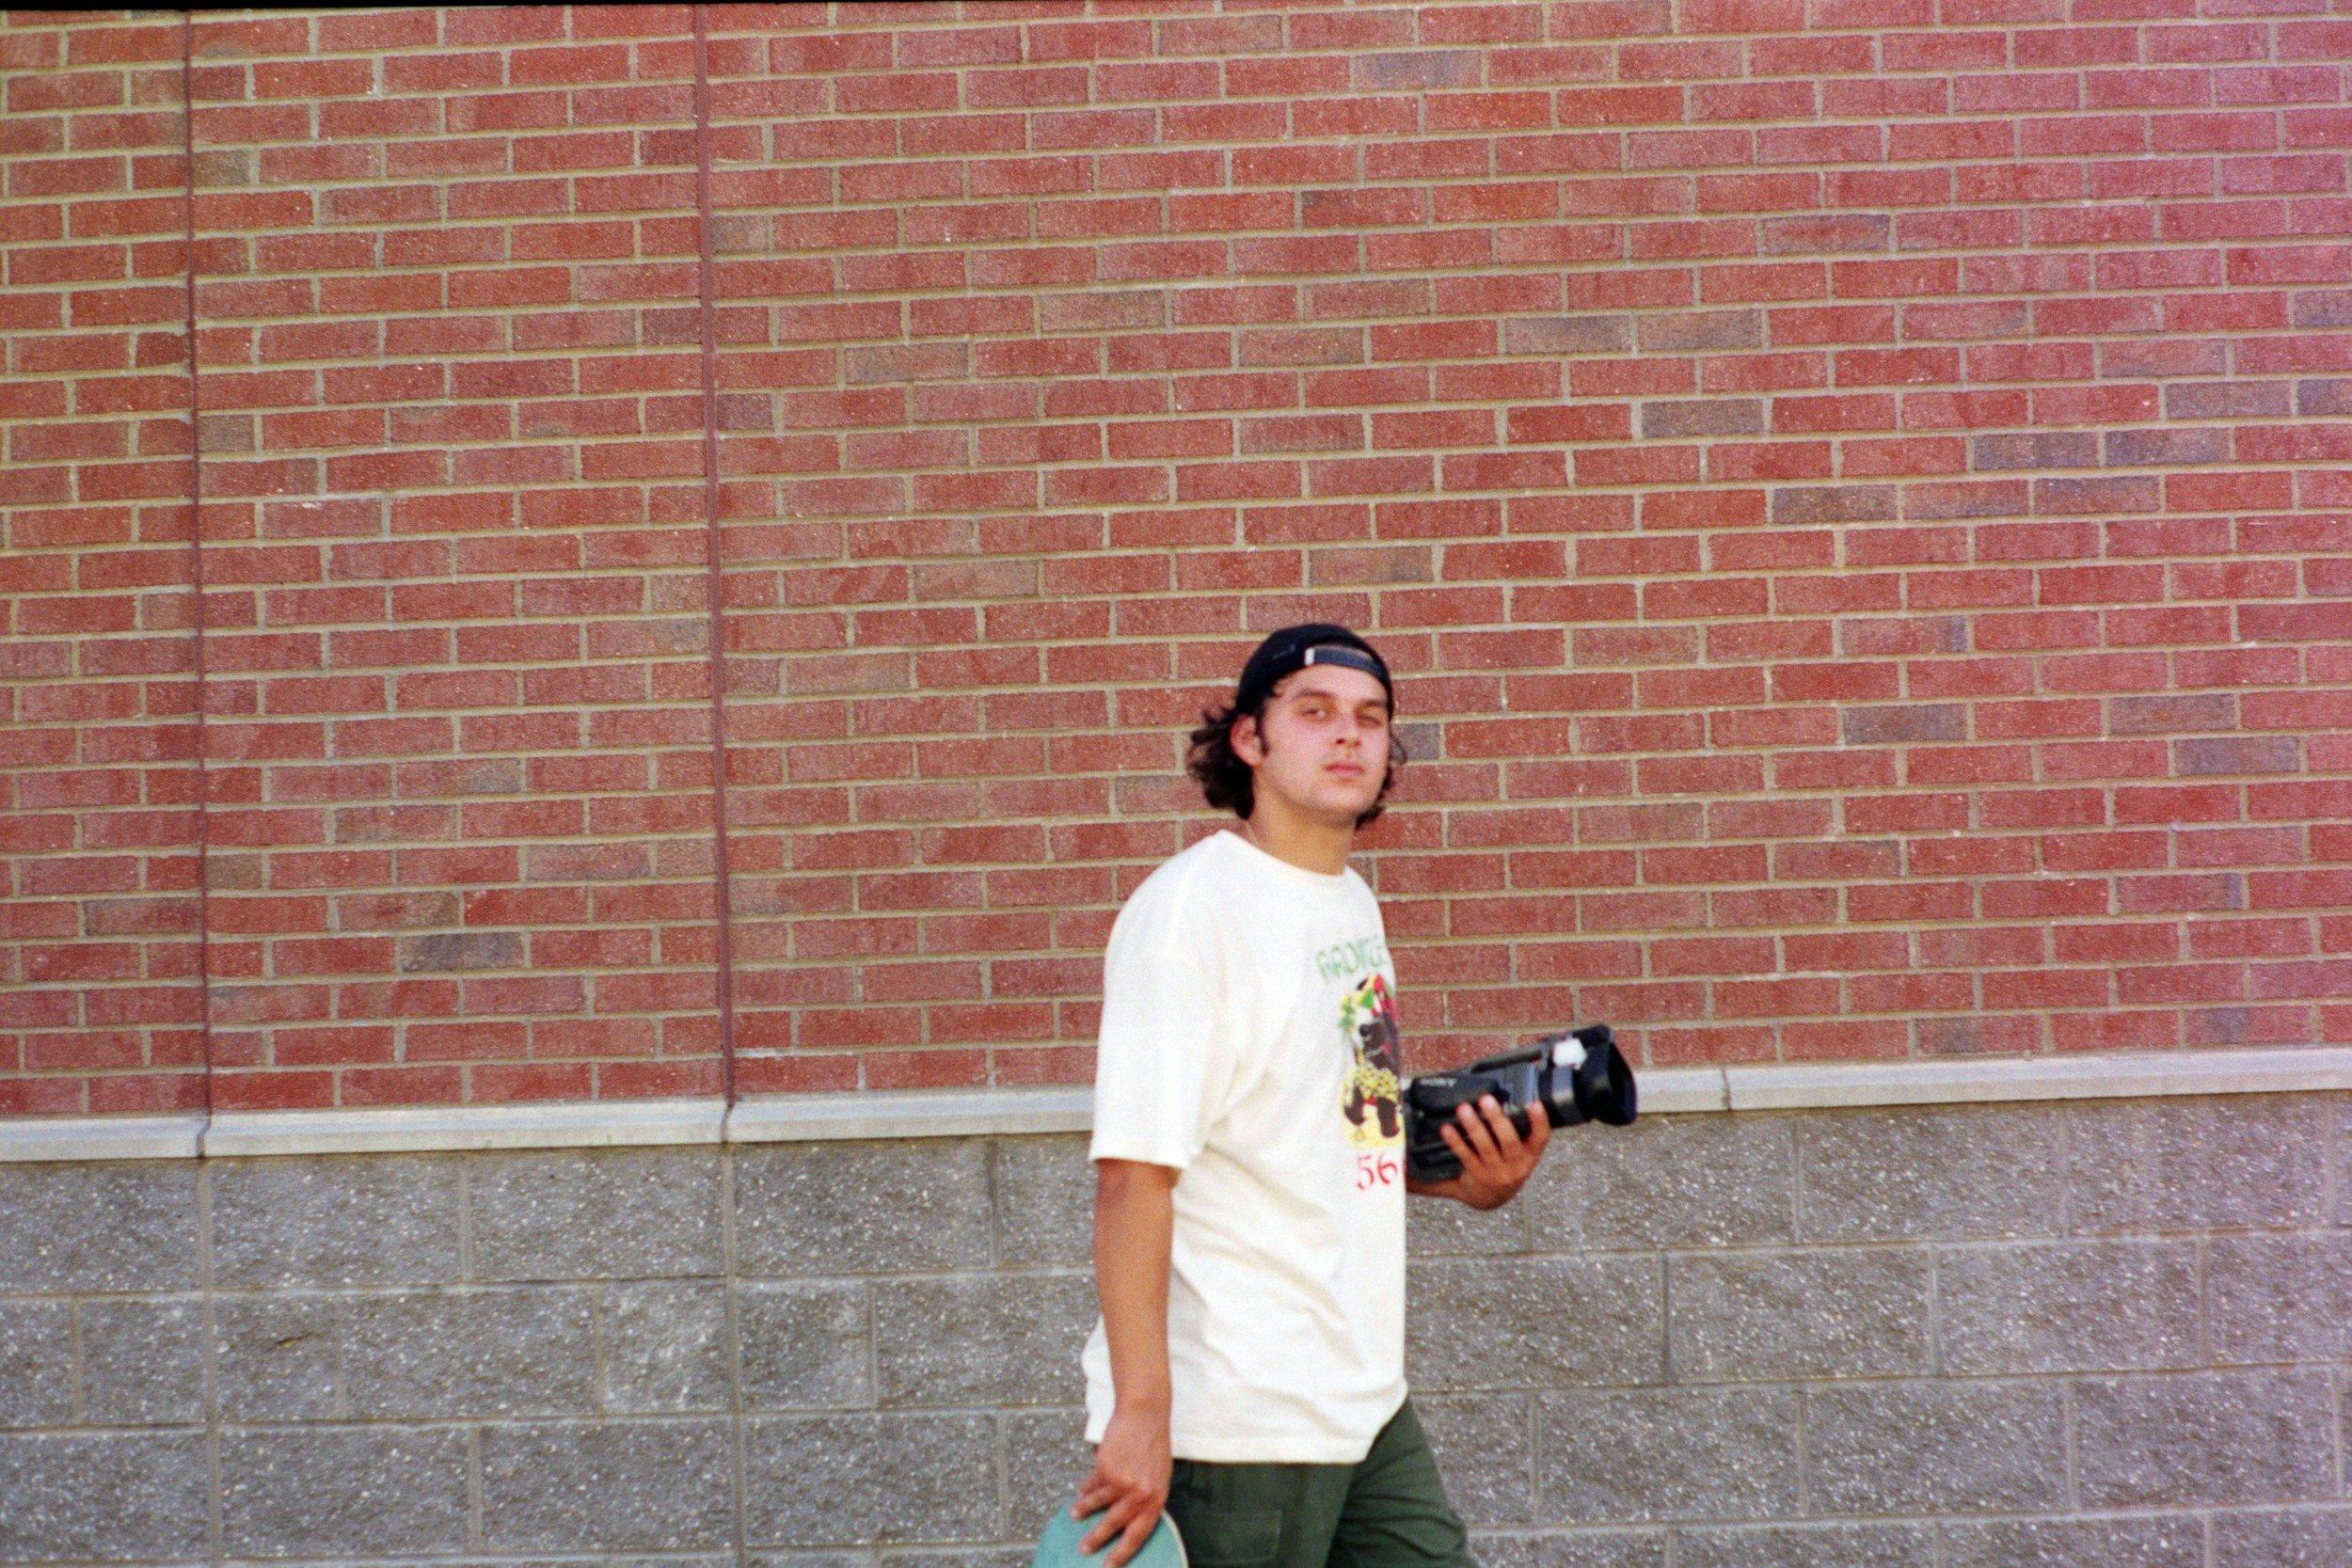 Matt Velez